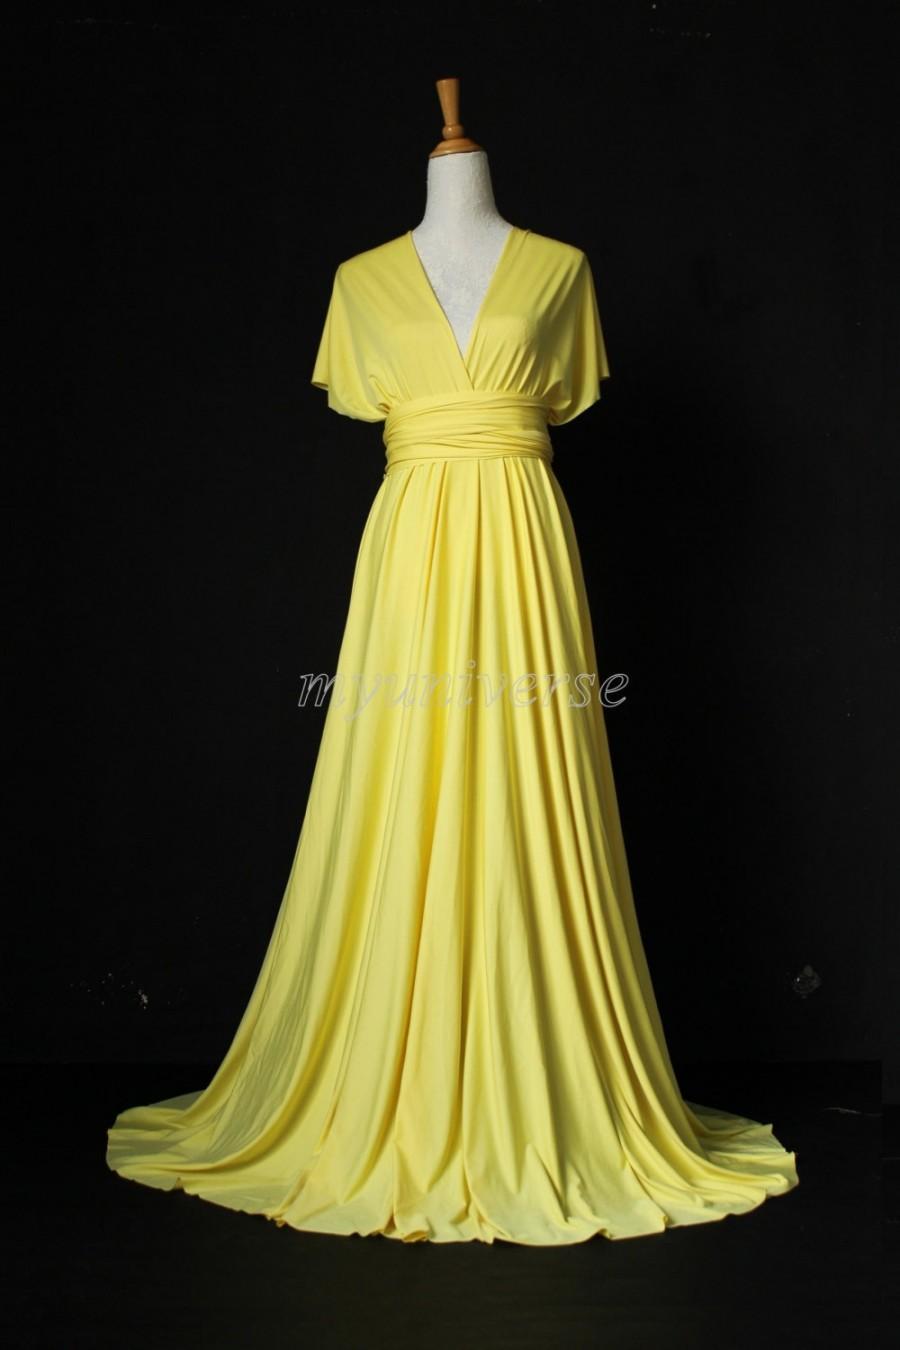 Mariage - Bridesmaid Dress Wedding Dress Infinity Dress Wrap Convertible Dress Evening Dress Yellow Daffodil